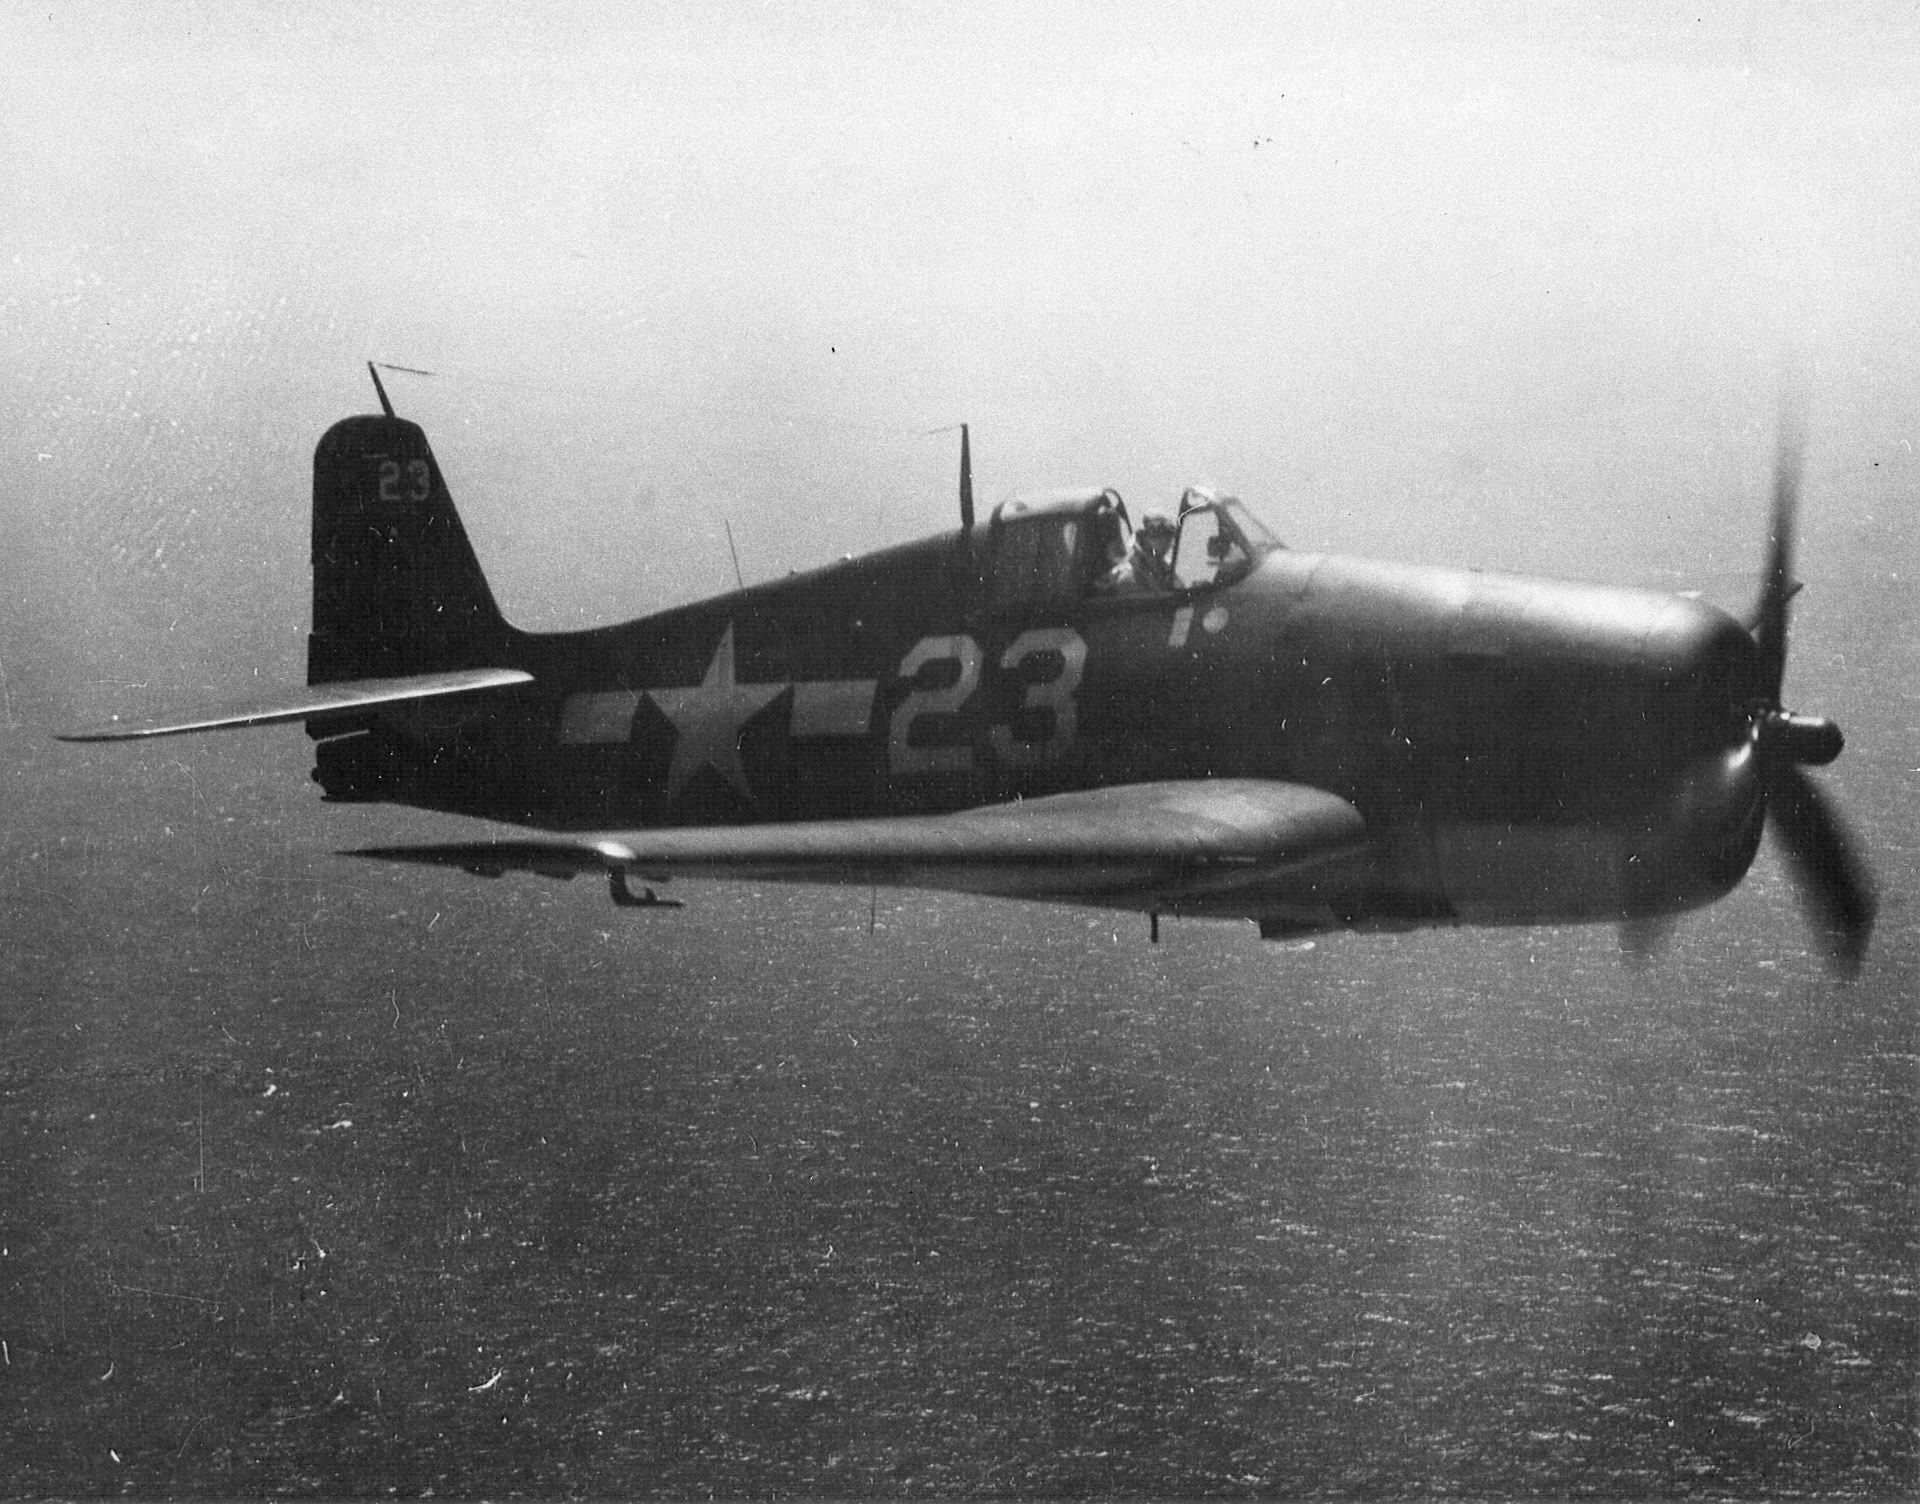 Grumman F6F 5 Hellcat VF 9 White 23 on patrol CV 16 USS Lexington 1945 01